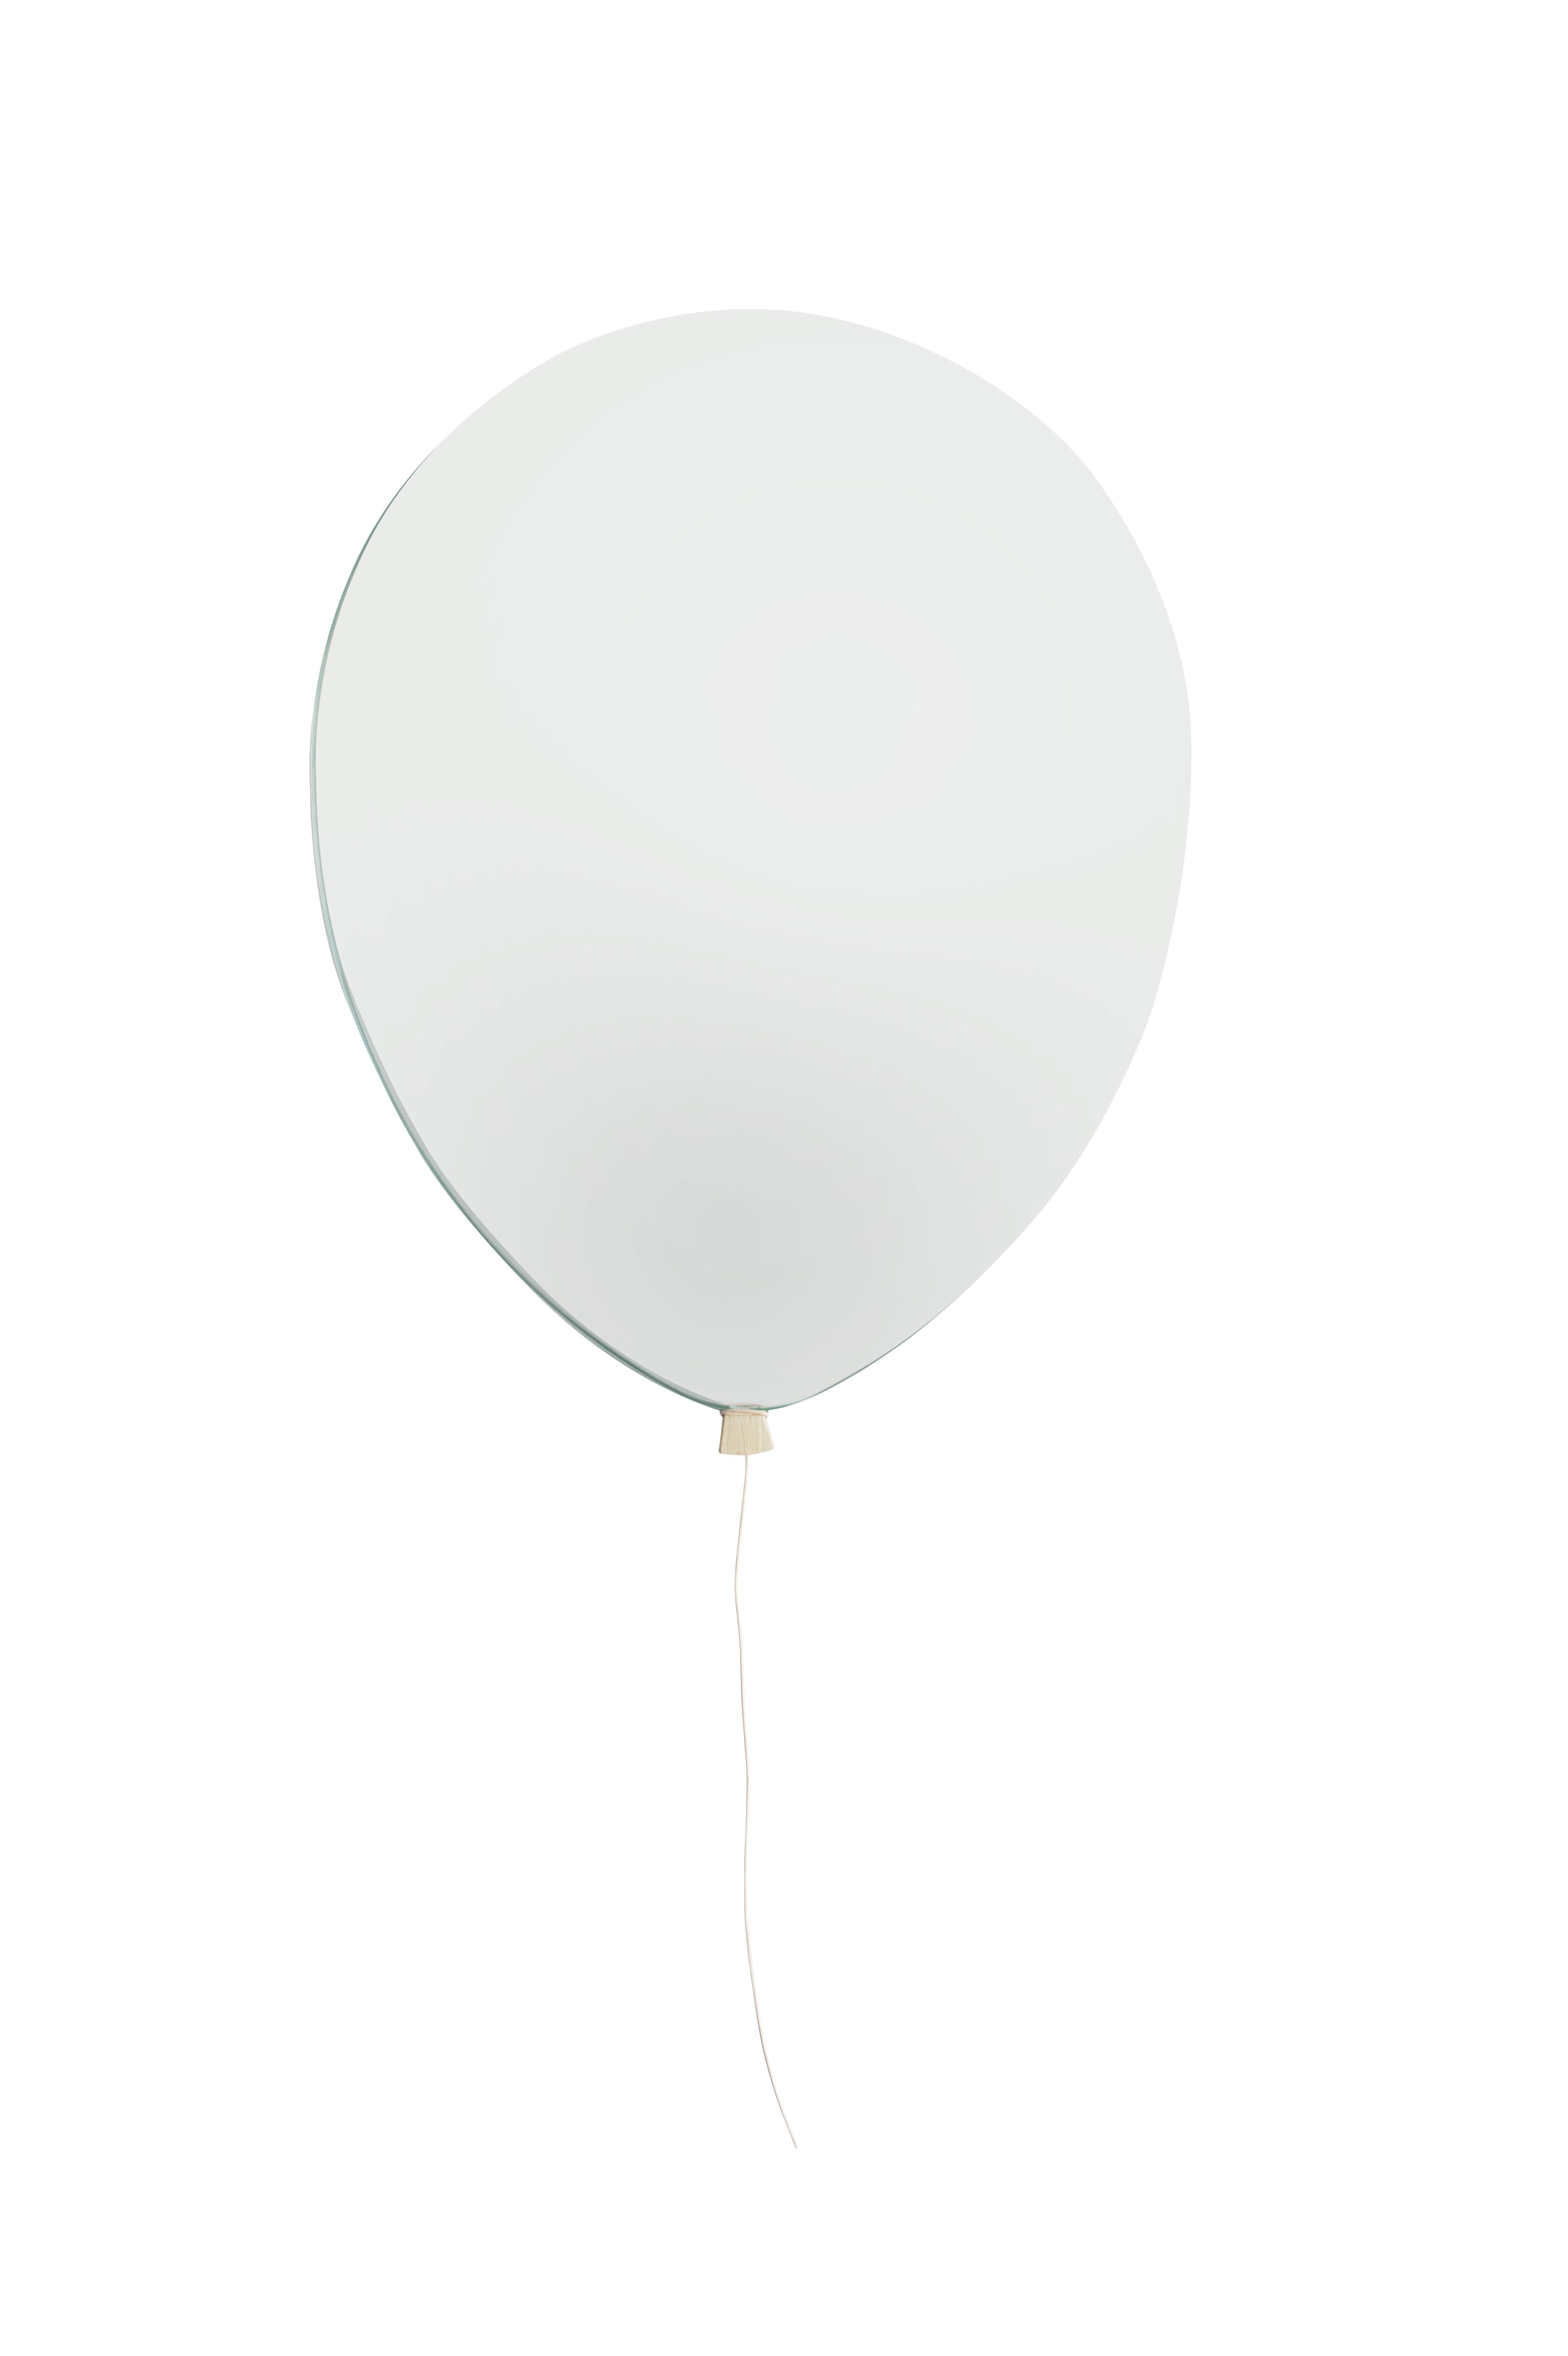 Decoration - Children's Home Accessories - Balloon Small Mirror - W 28 x H 36 cm by EO - Miror - Leather, Mirror, Oak